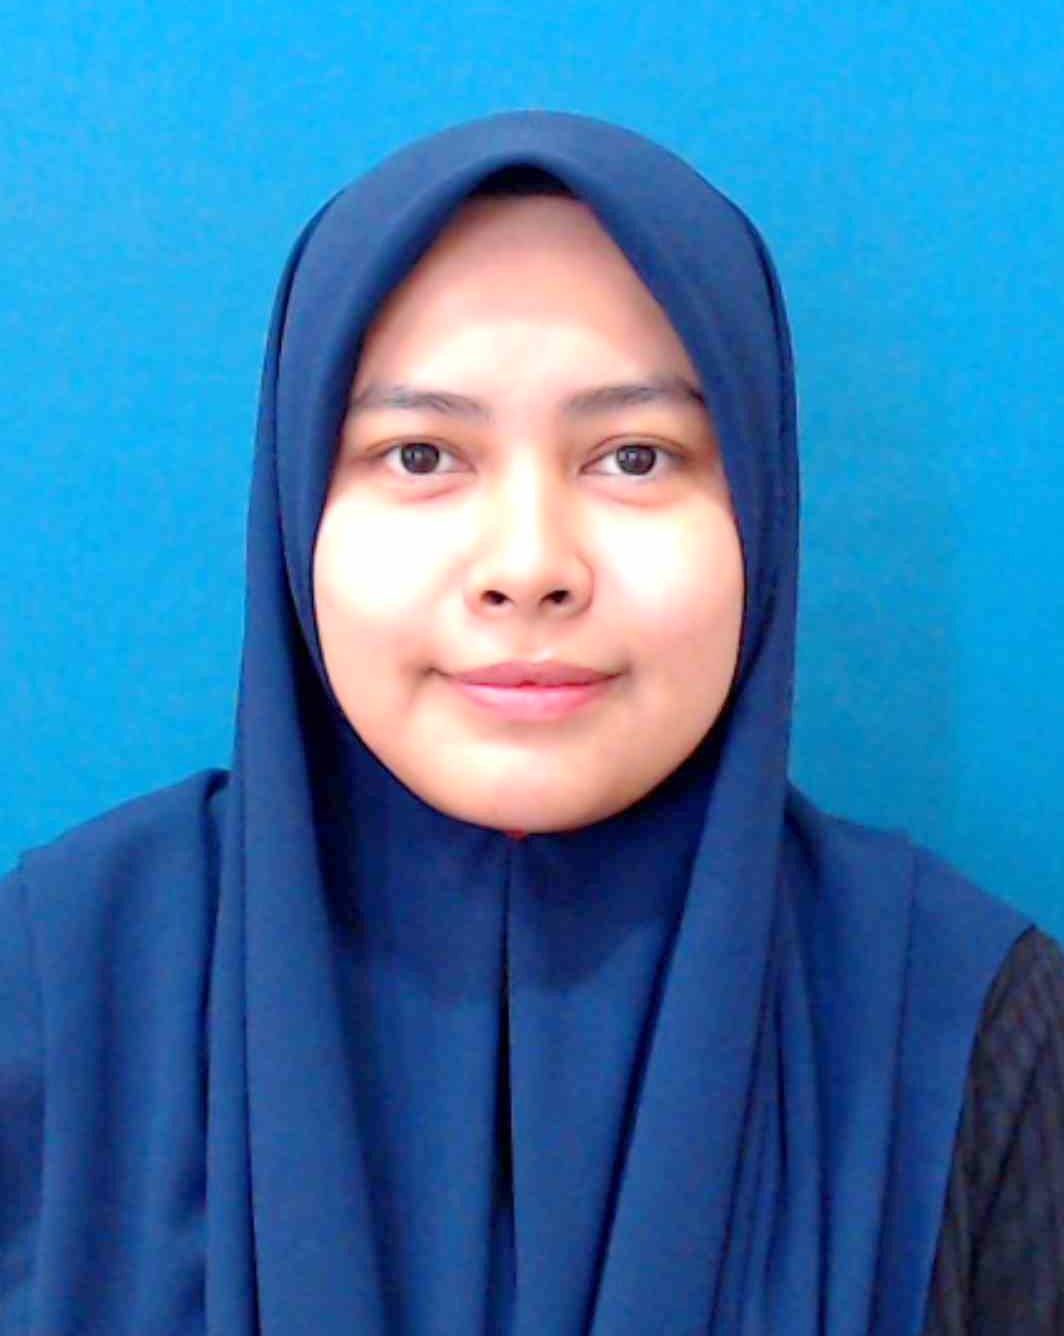 Nursofiah Binti Mohd Din